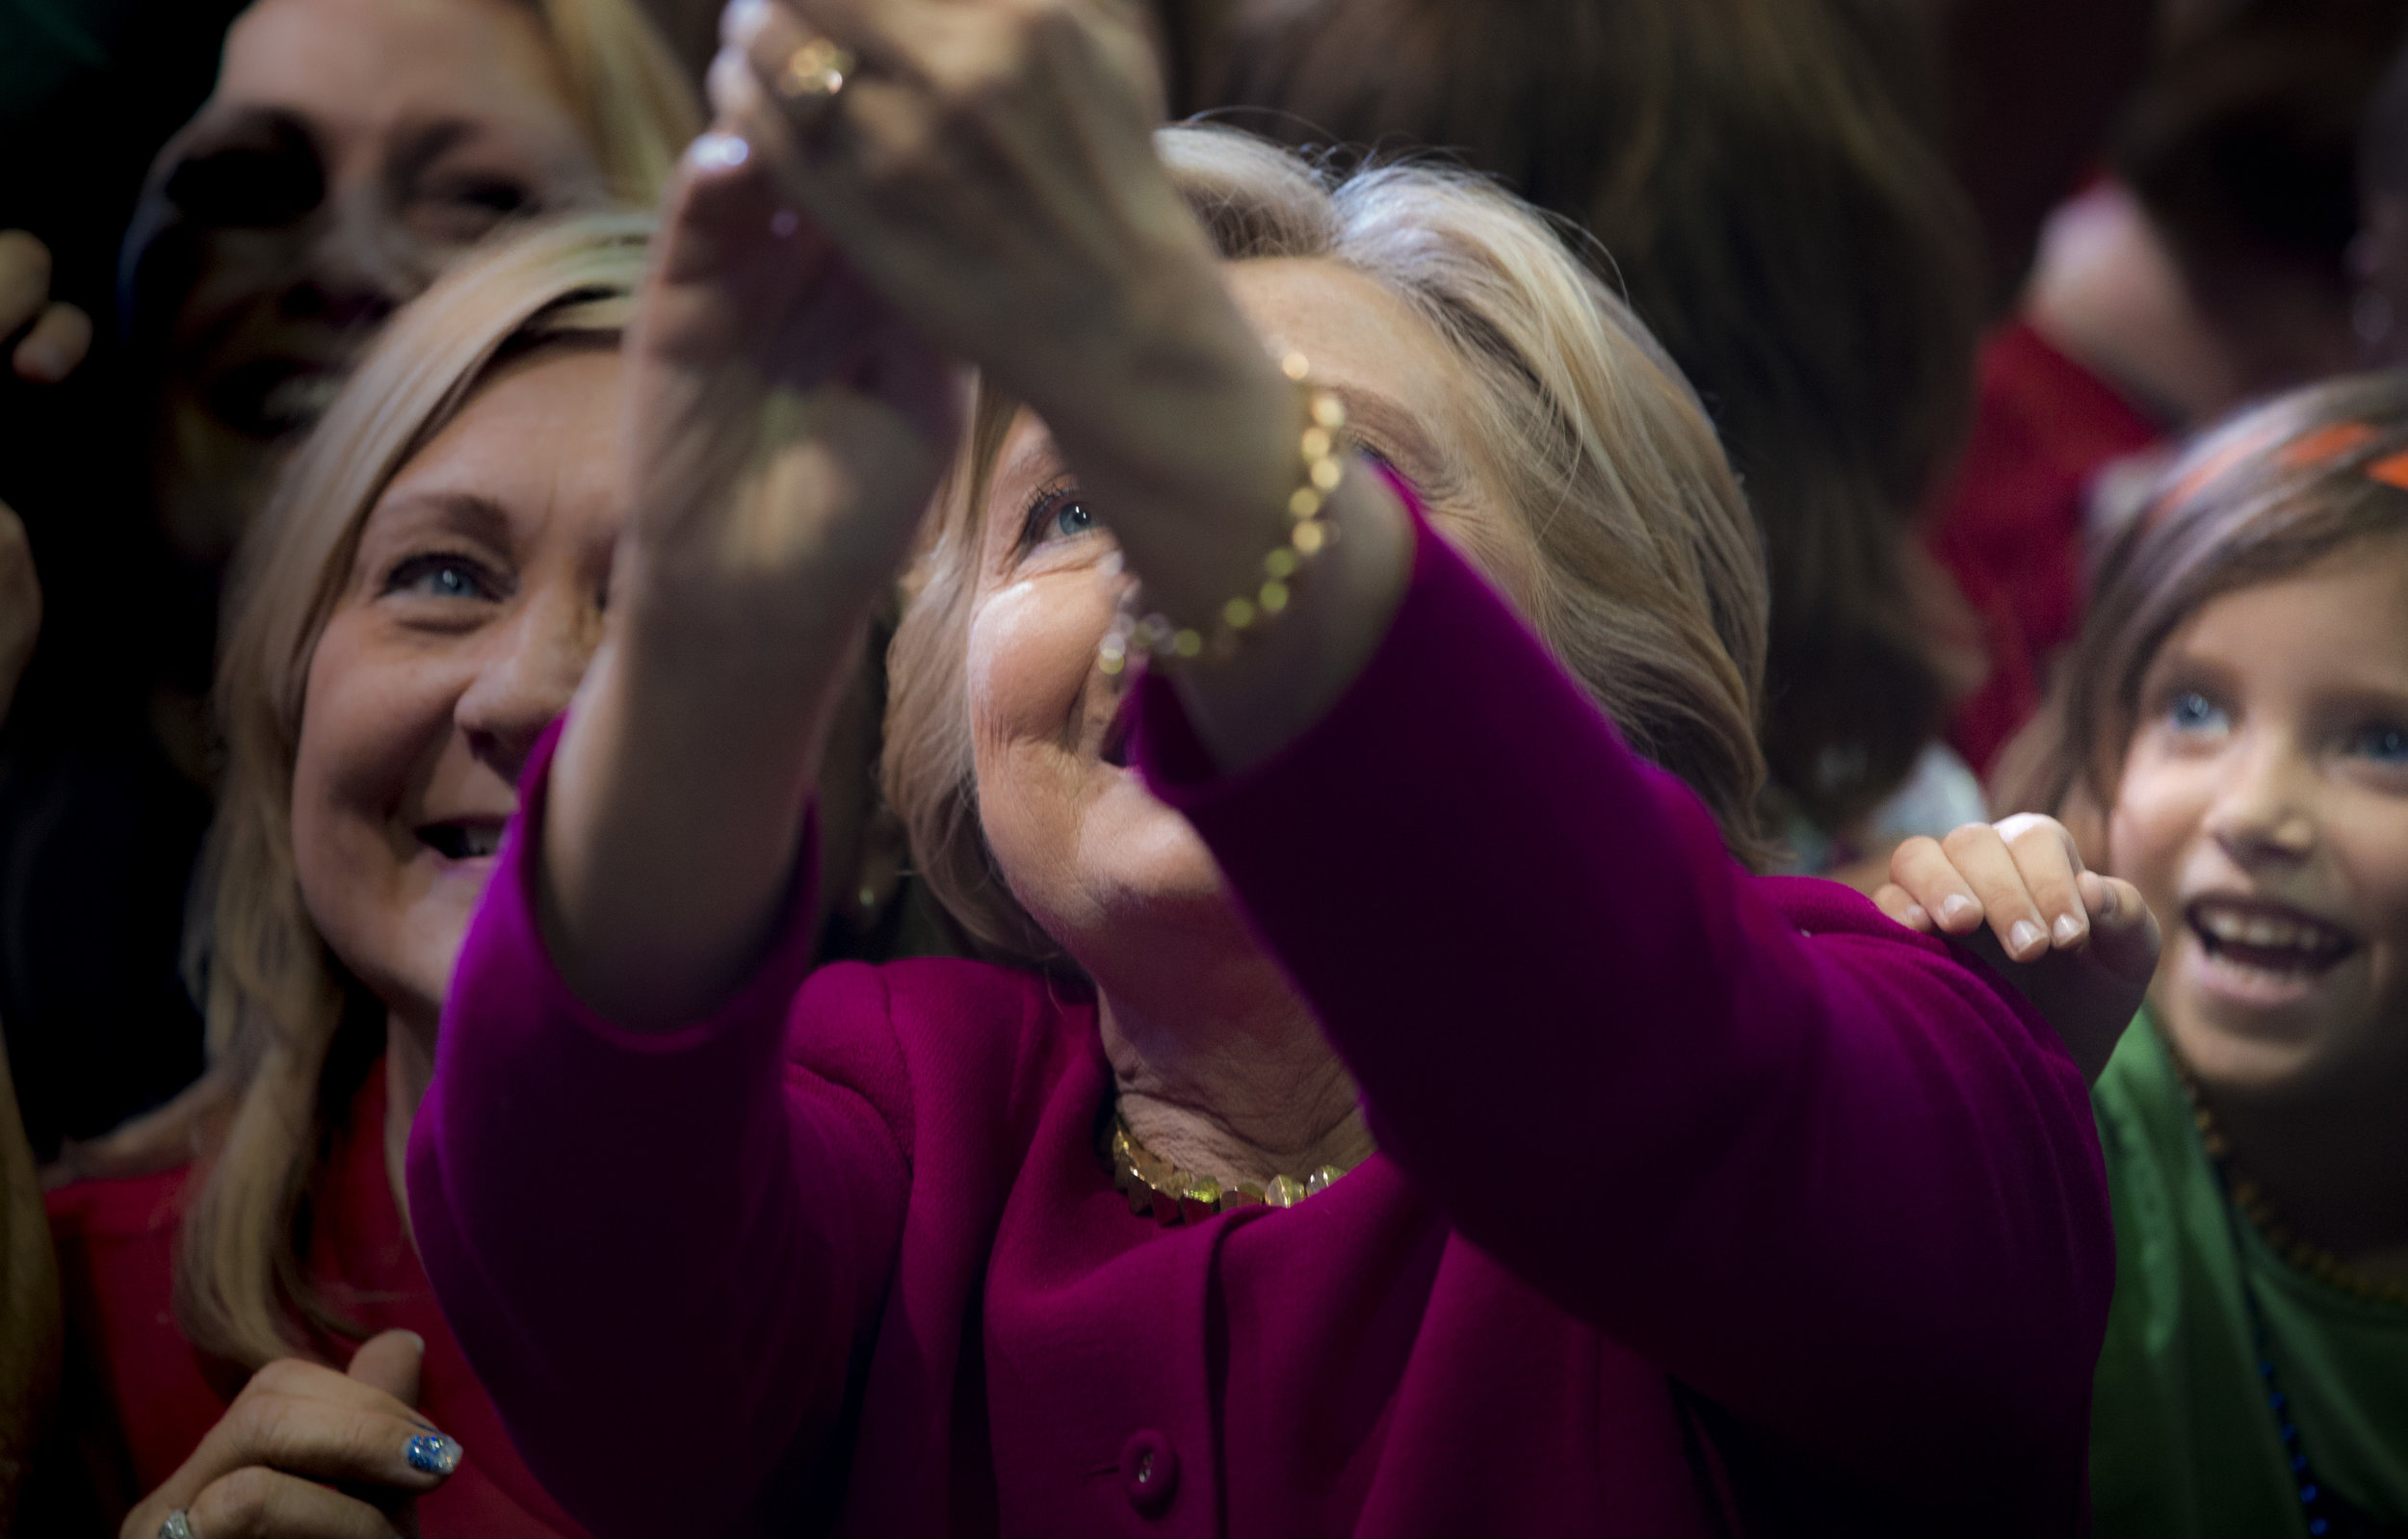 10042016_BJM_Hillary_Clinton_Campaigns_in_Harrisburg_Pennsylvania_35.jpg